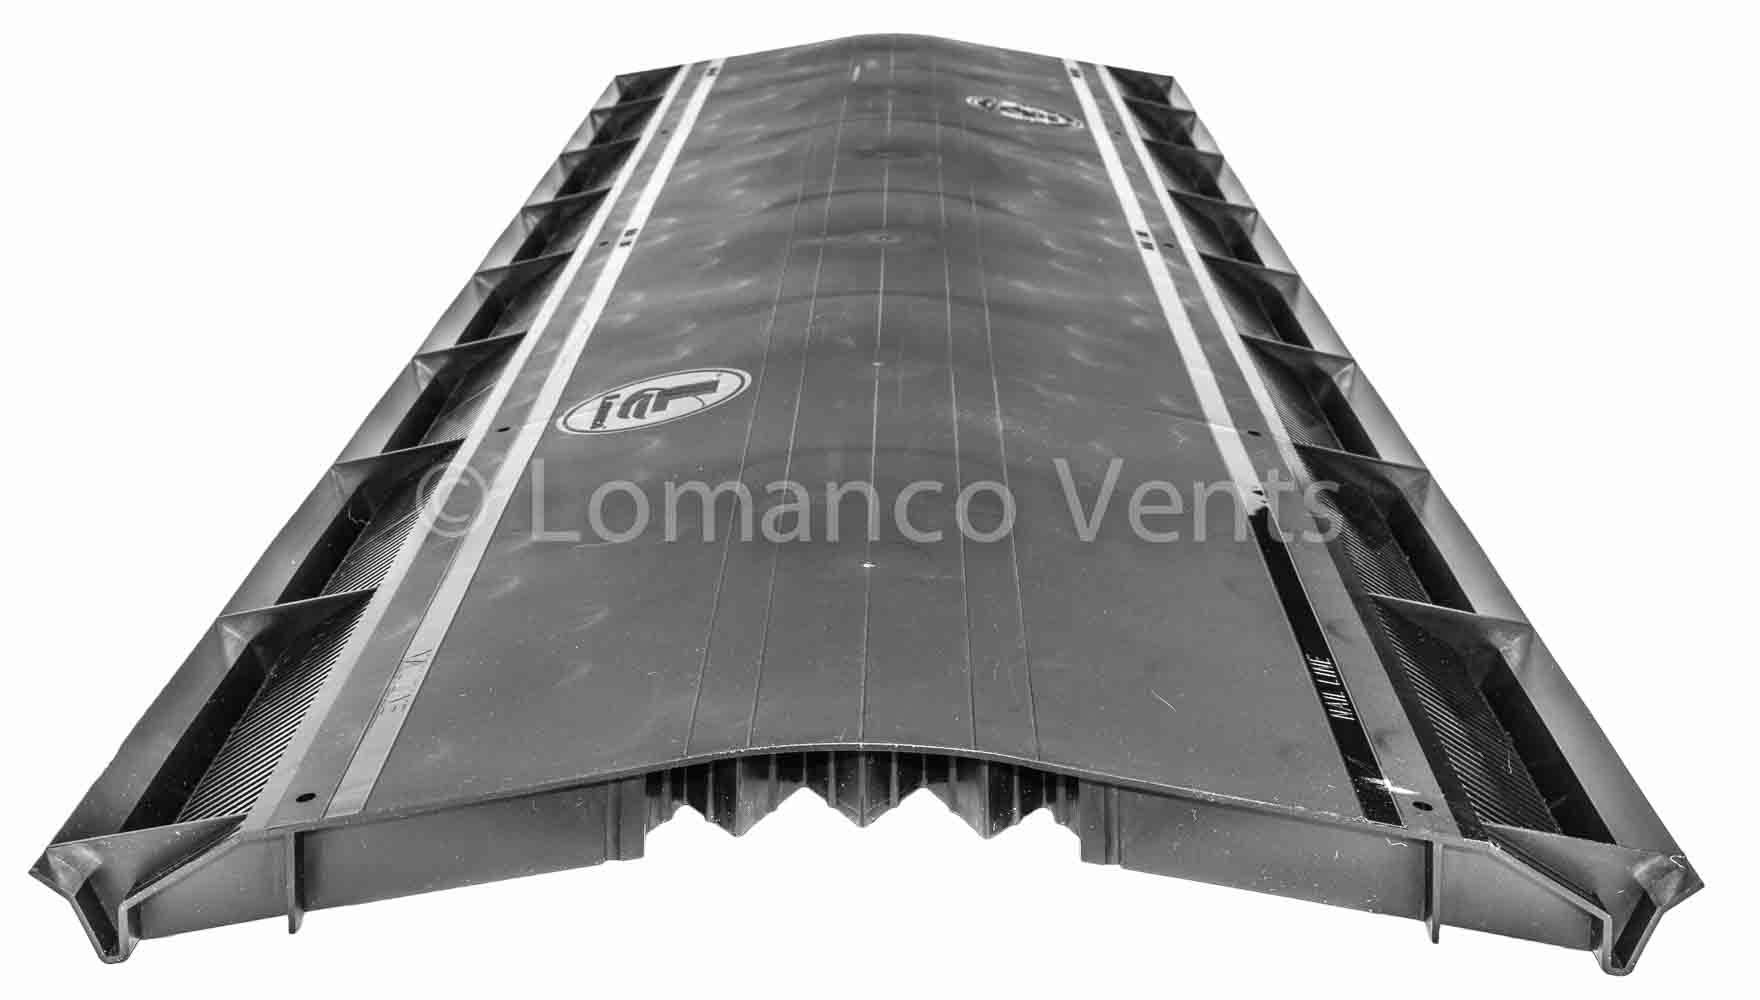 Lomanco Vents Ridge Vents